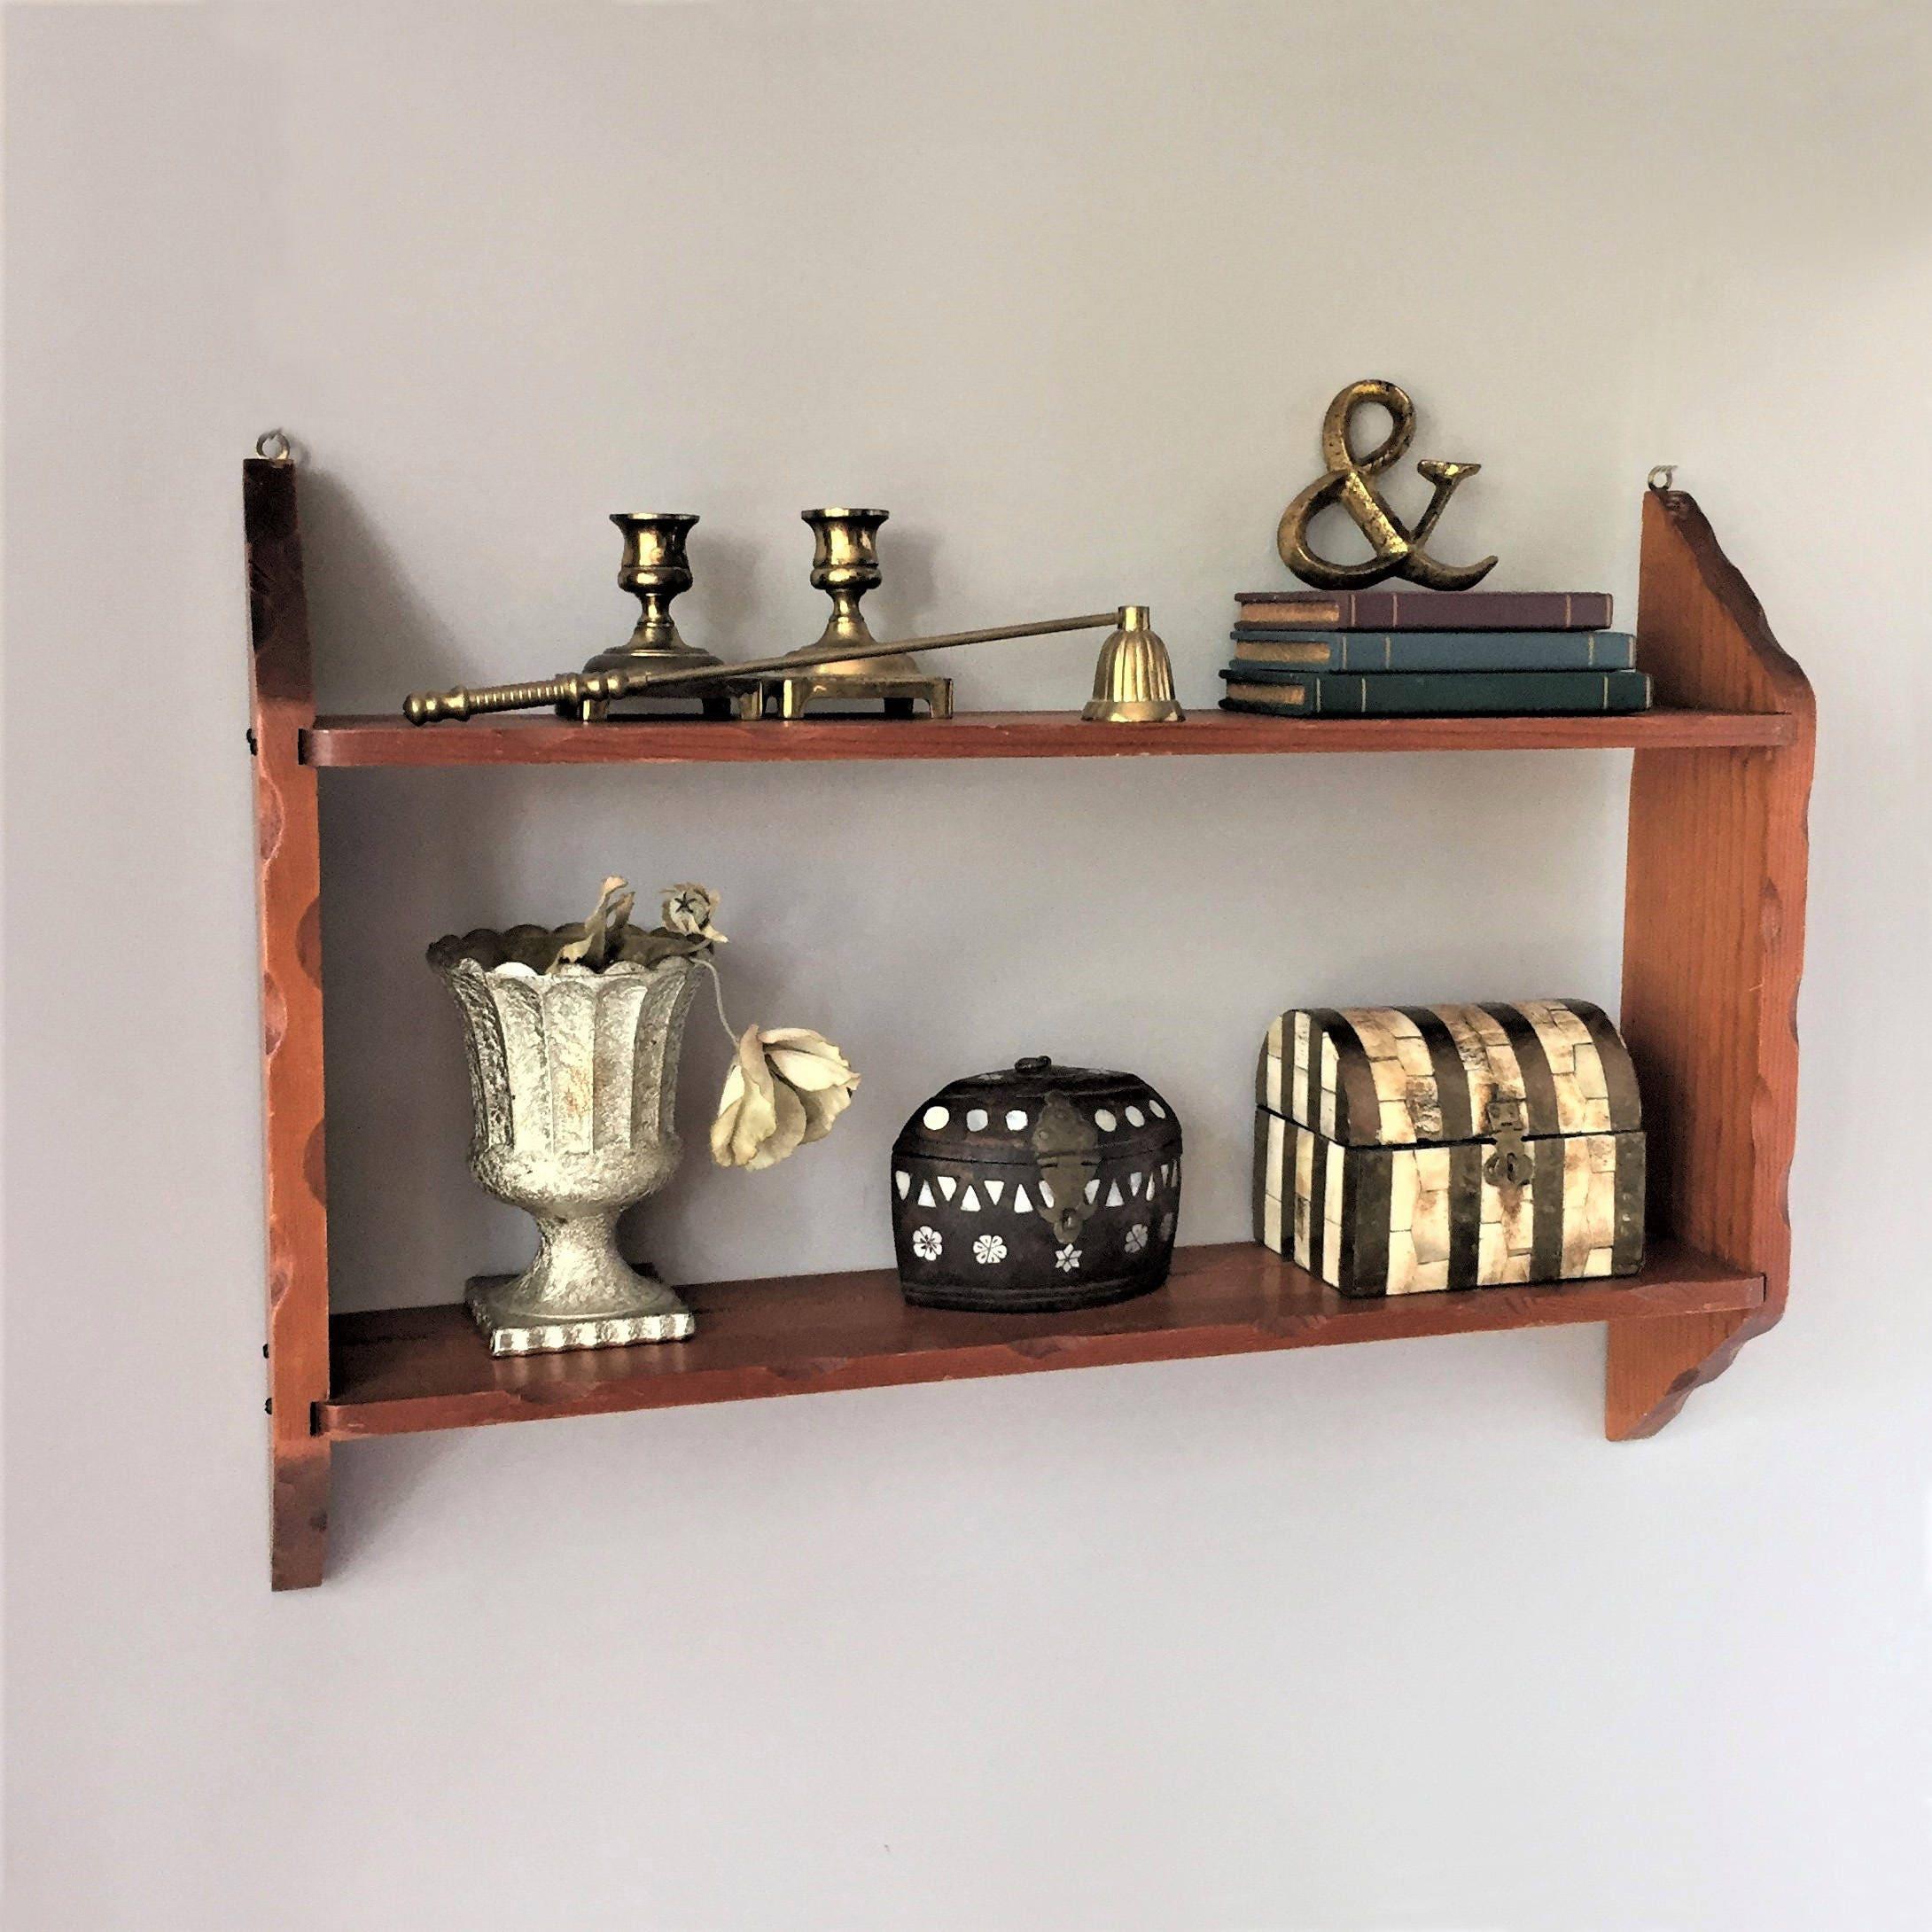 Plate Shelf Vintage Kitchen Shelf Wooden Display Shelf